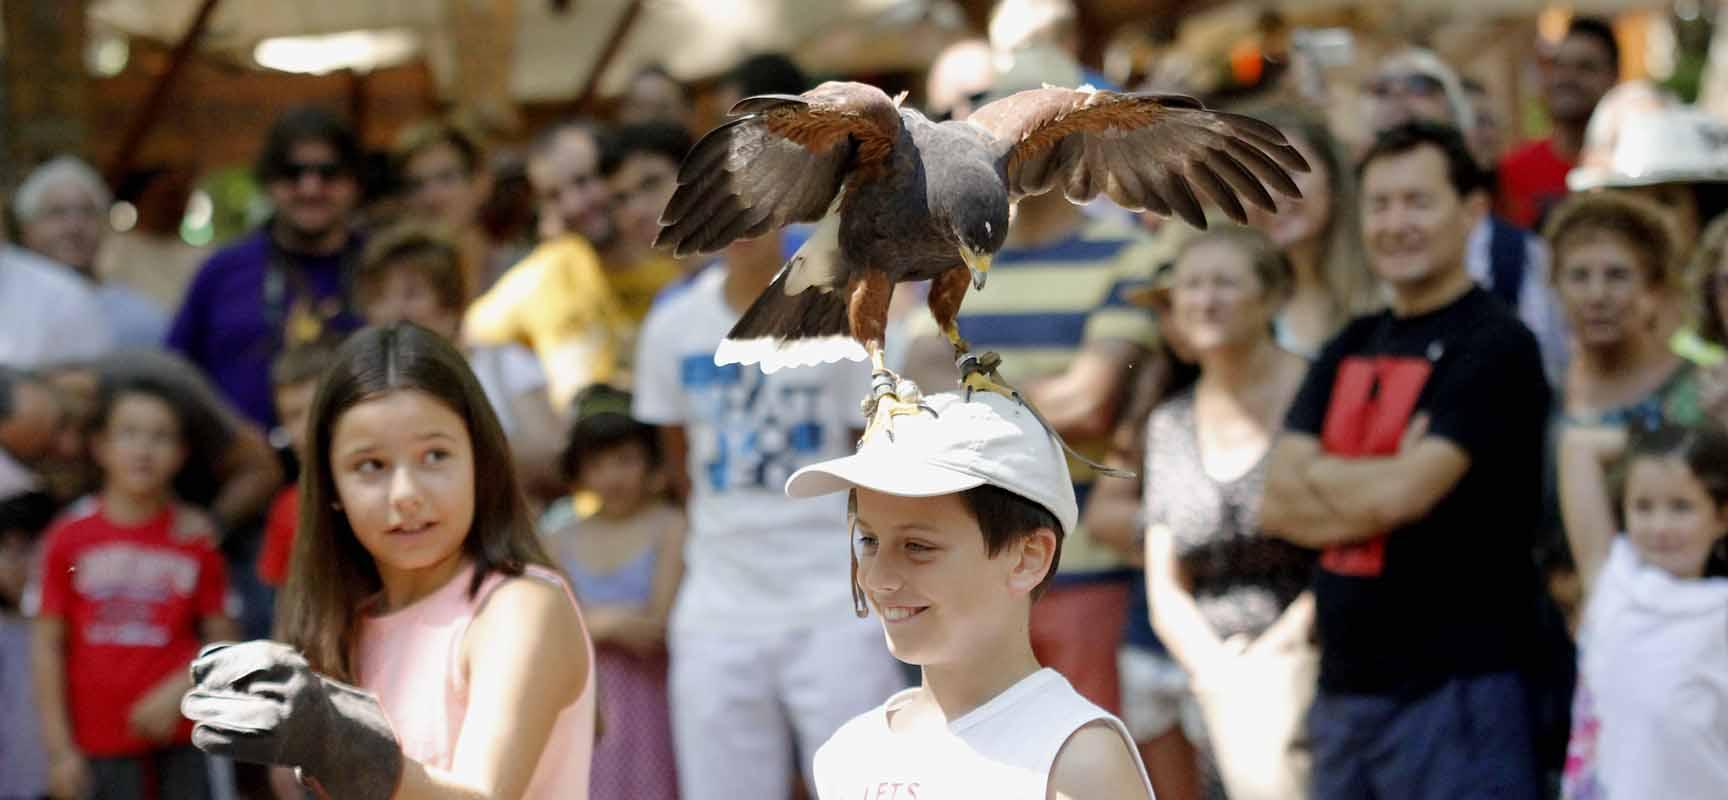 La Feria Medieval Mudéjar tendrá lugar del 22 al 24 de agosto.